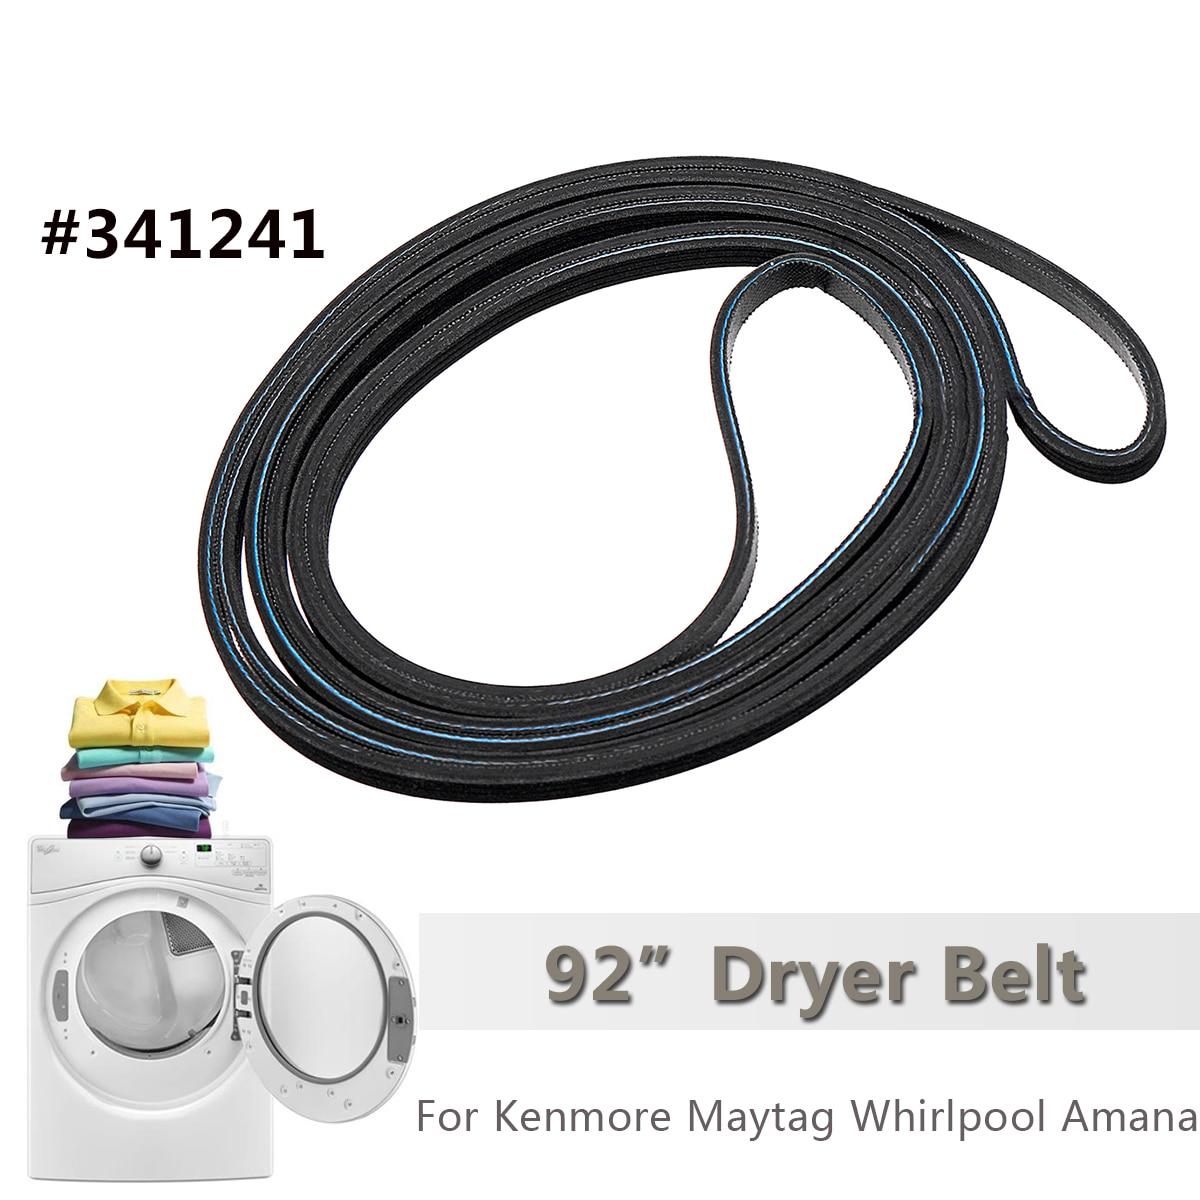 Whirlpool Kenmore Dryer Belt 695055 697388 694088 8206 P46-149 P46-037